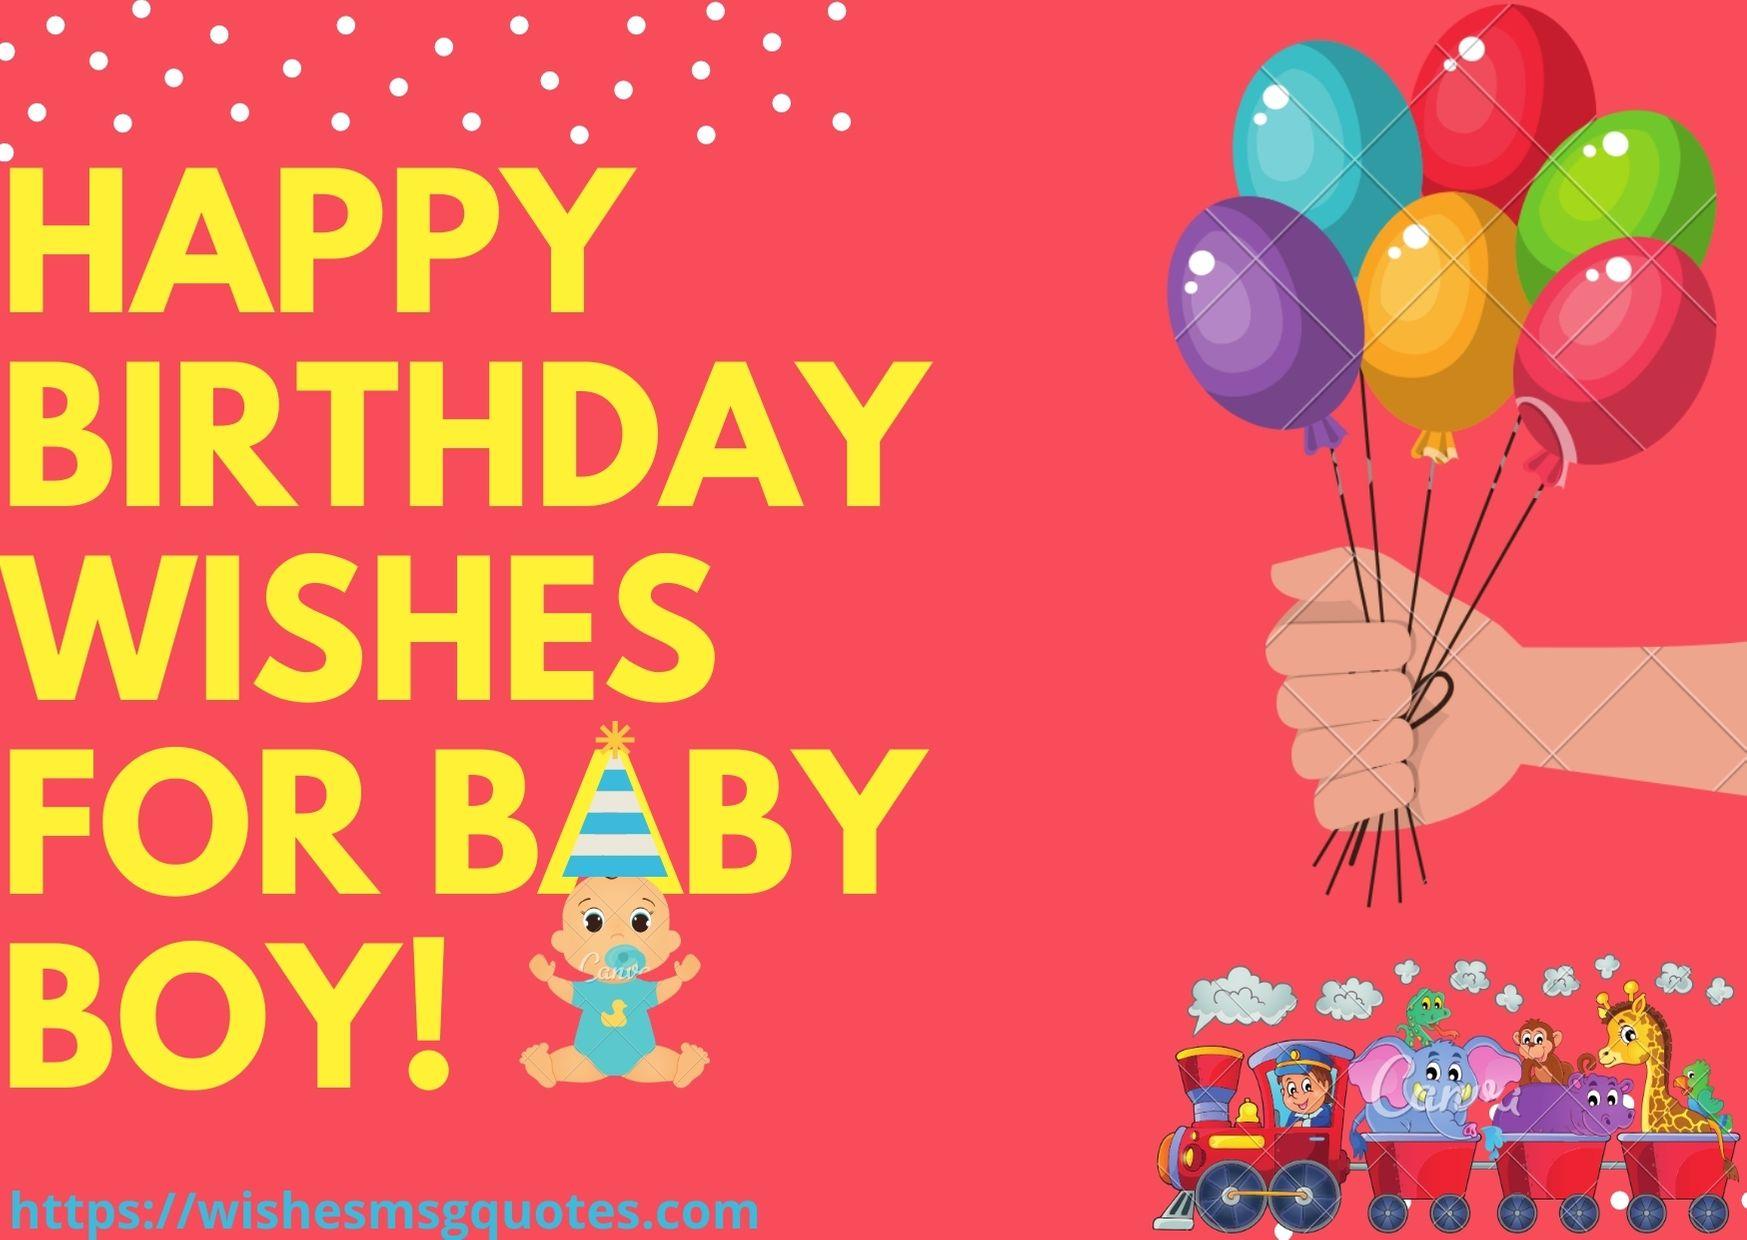 100 Happy Birthday Wishes For Baby Boy